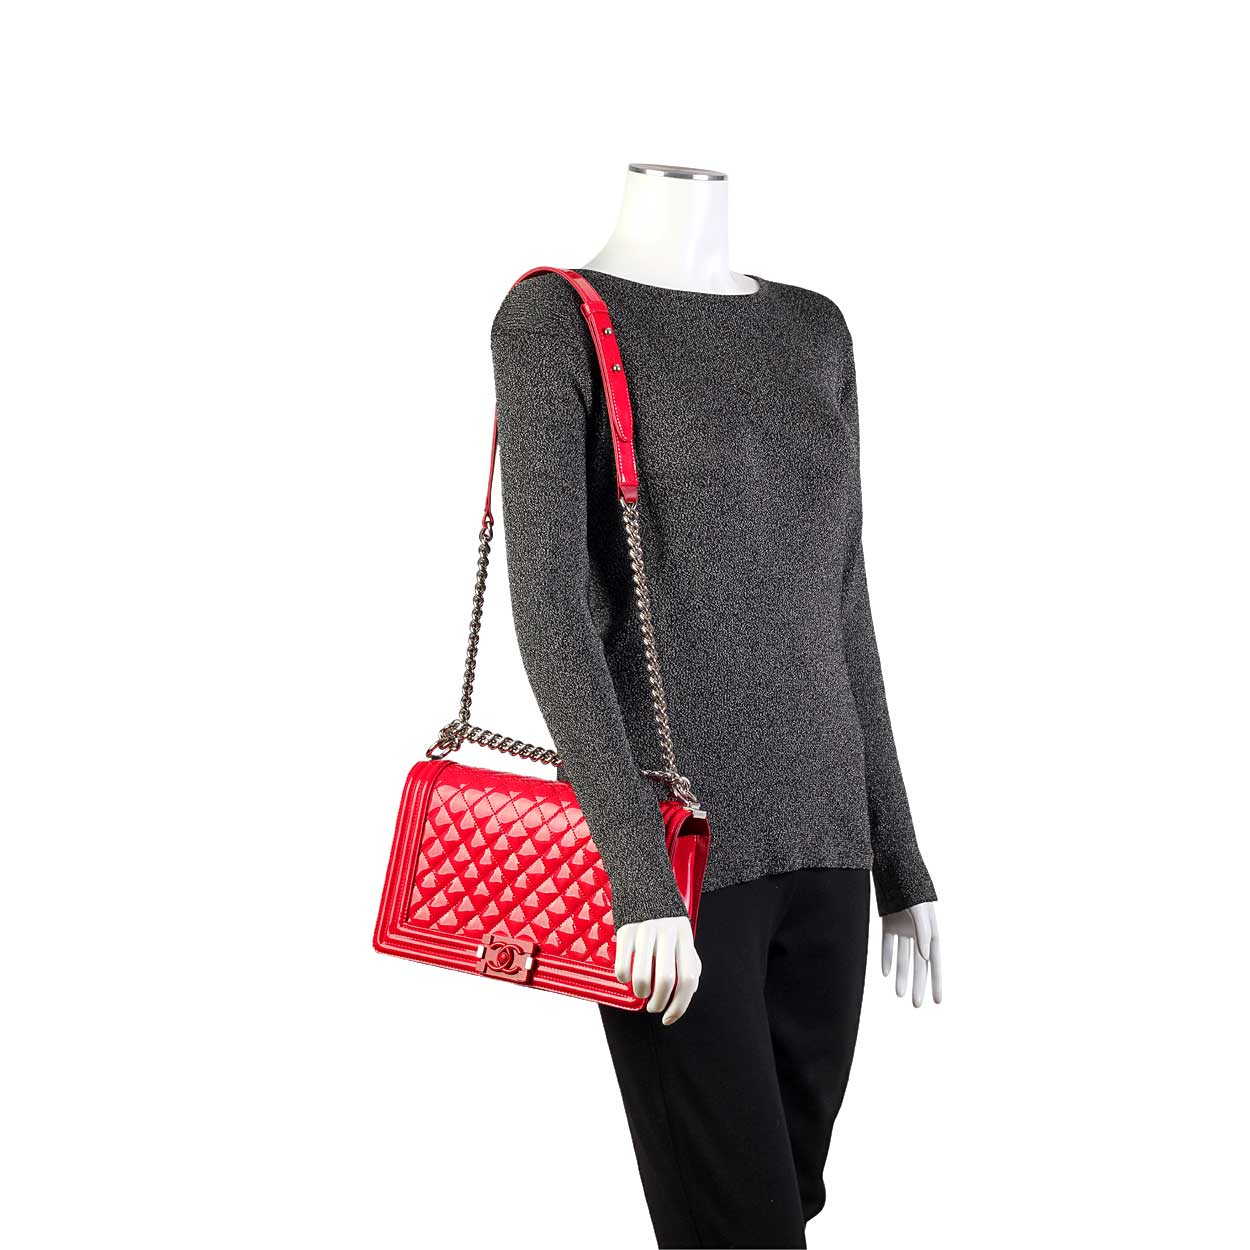 164b04c6c899 CHANEL New Medium Boy Flap Red Patent Leather-Mannequin